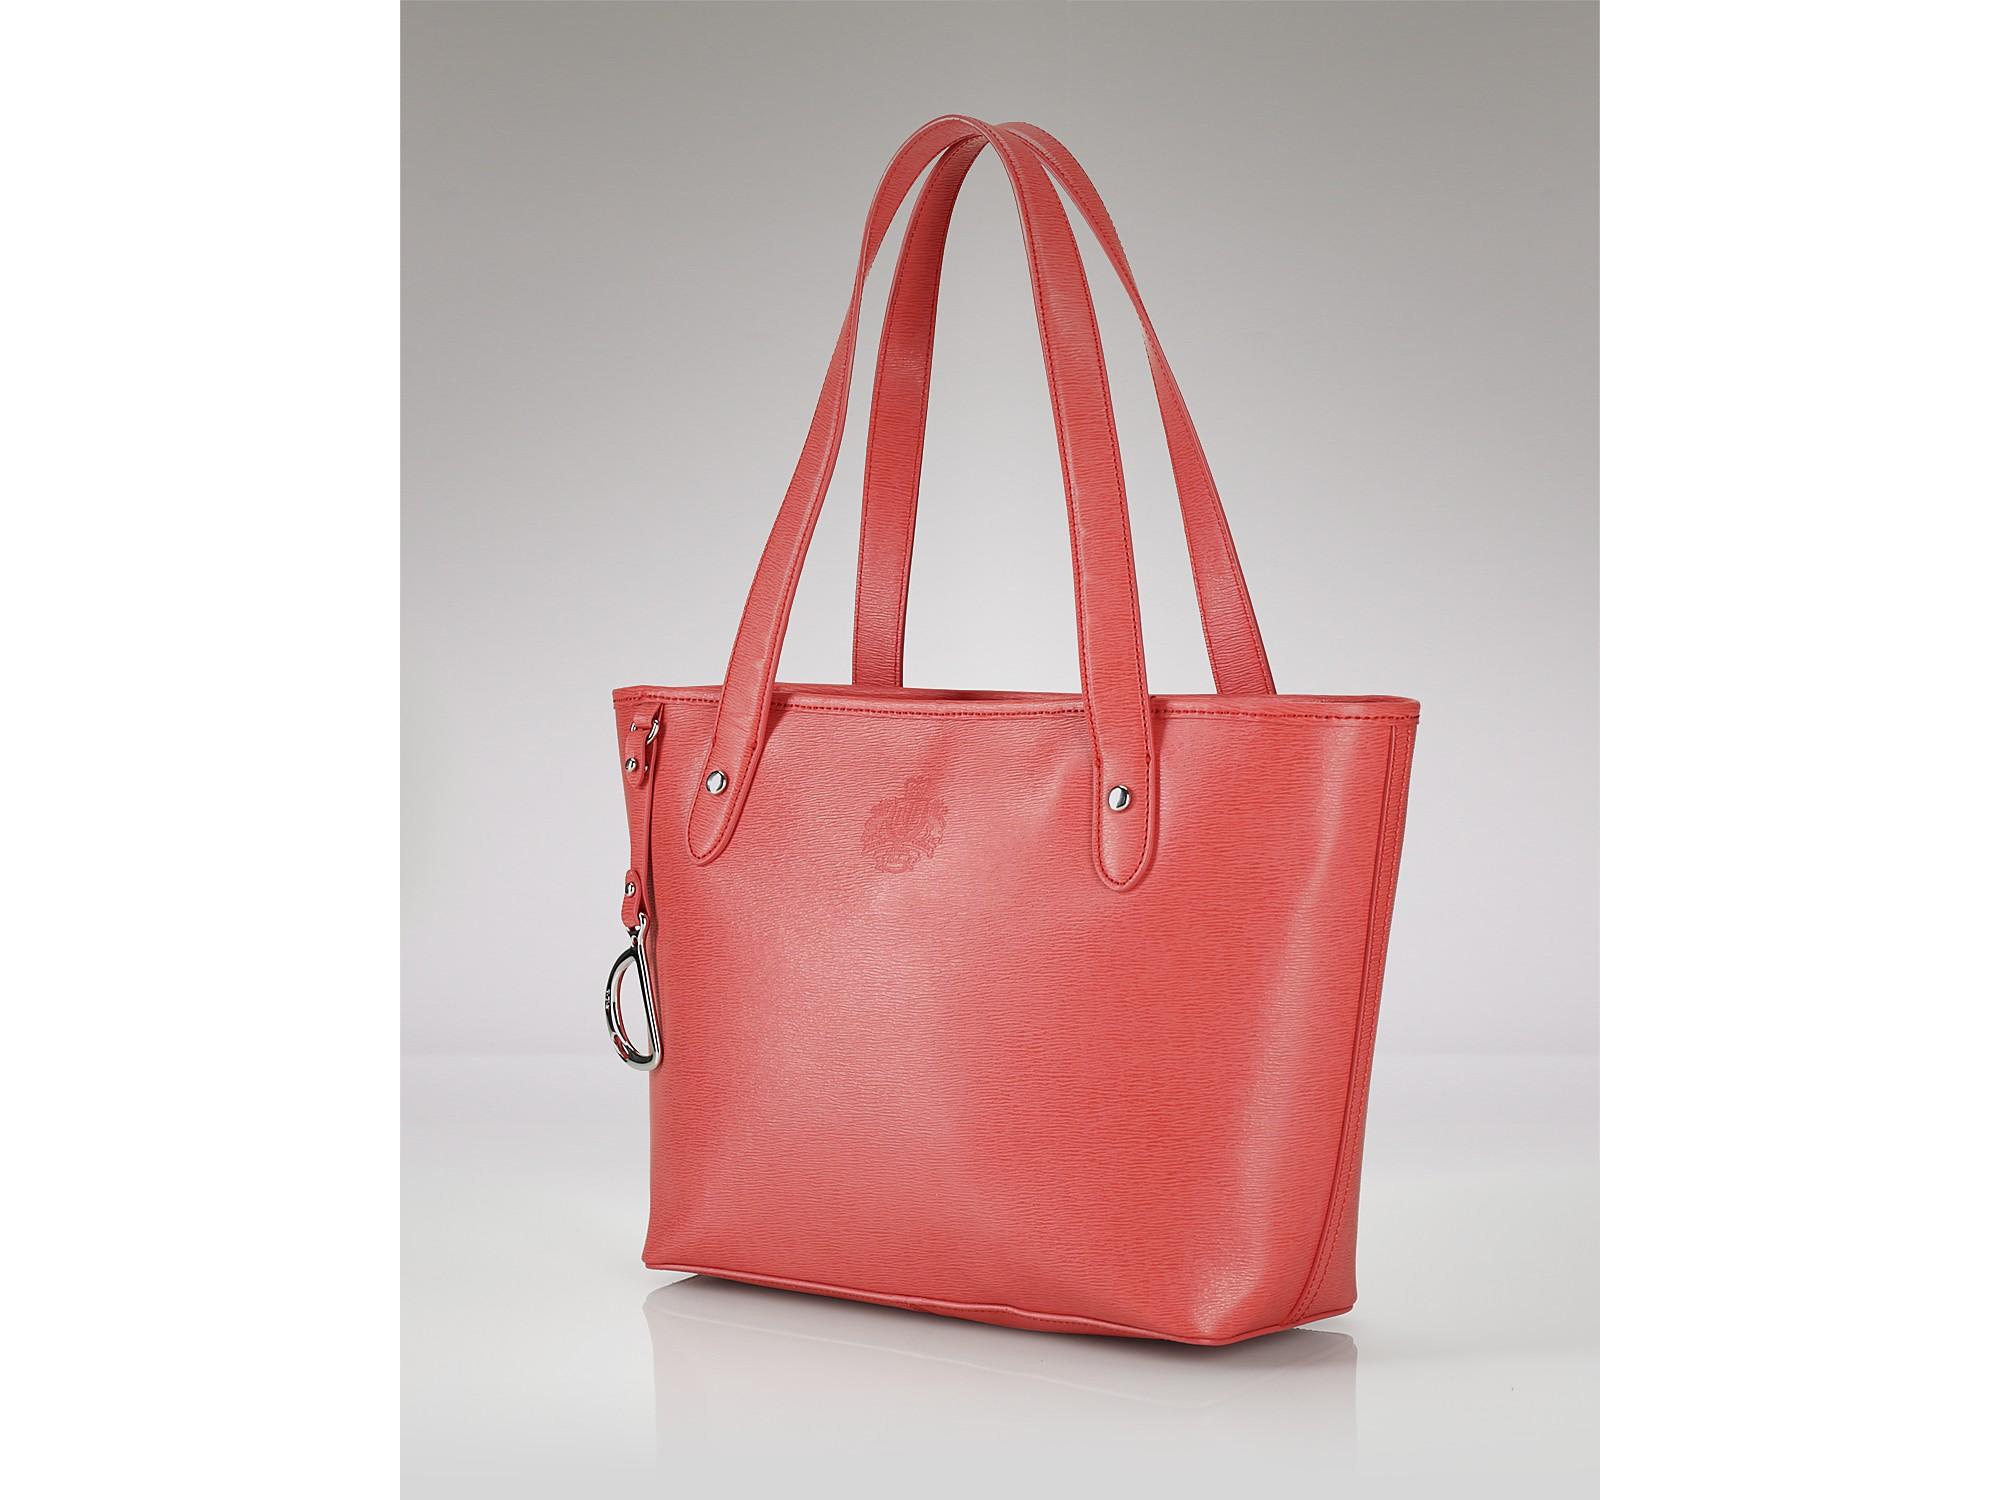 Ralph Lauren Tote Laukku : Lauren by ralph newbury per tote in pink coral